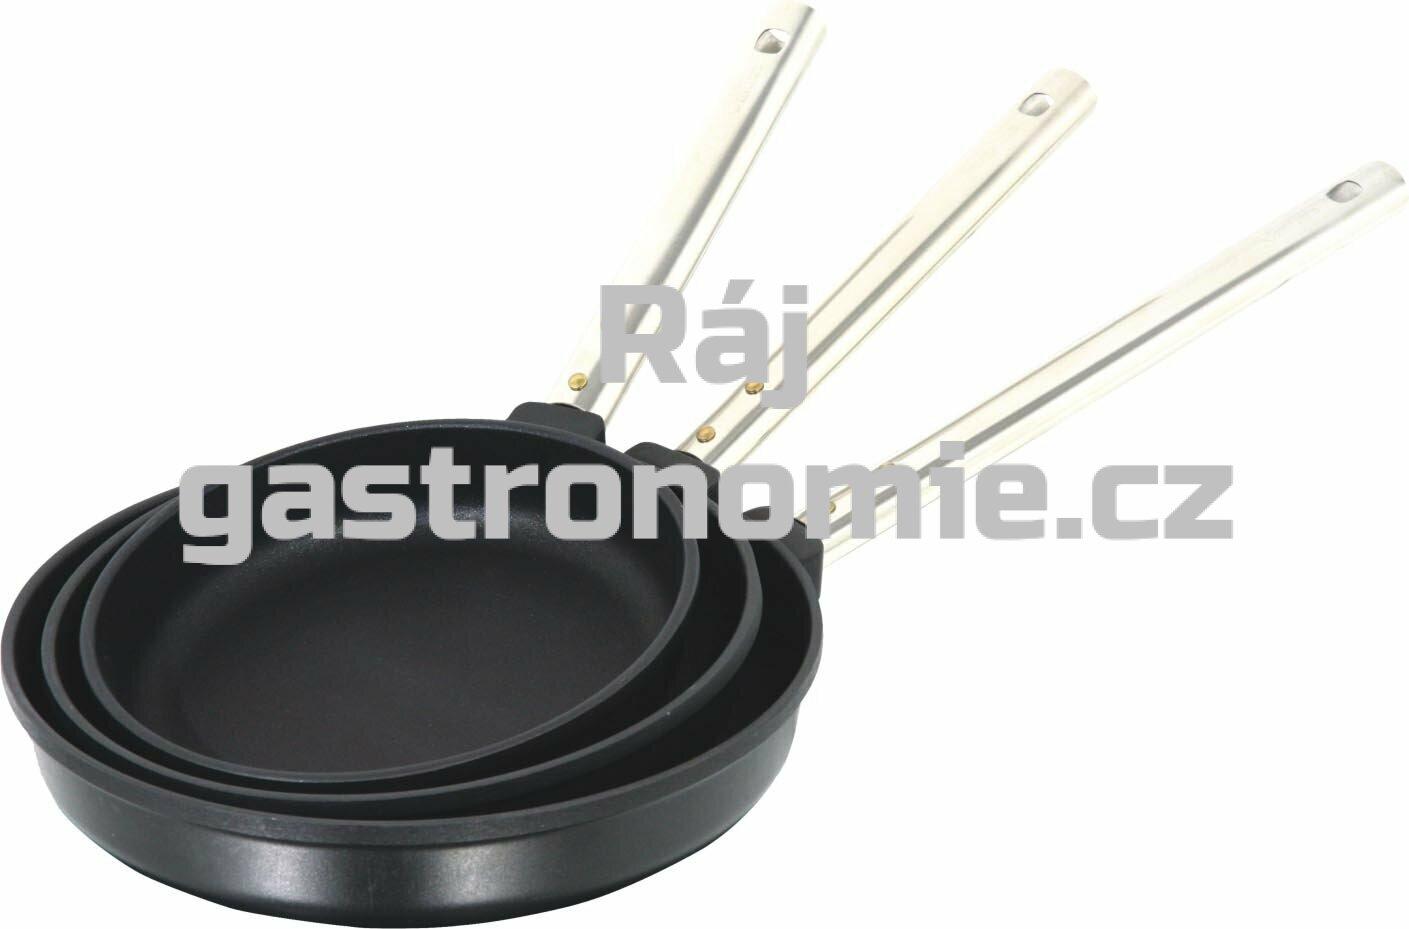 Pánev Valira PLATINUM (Ø240mm, 1,1kg)